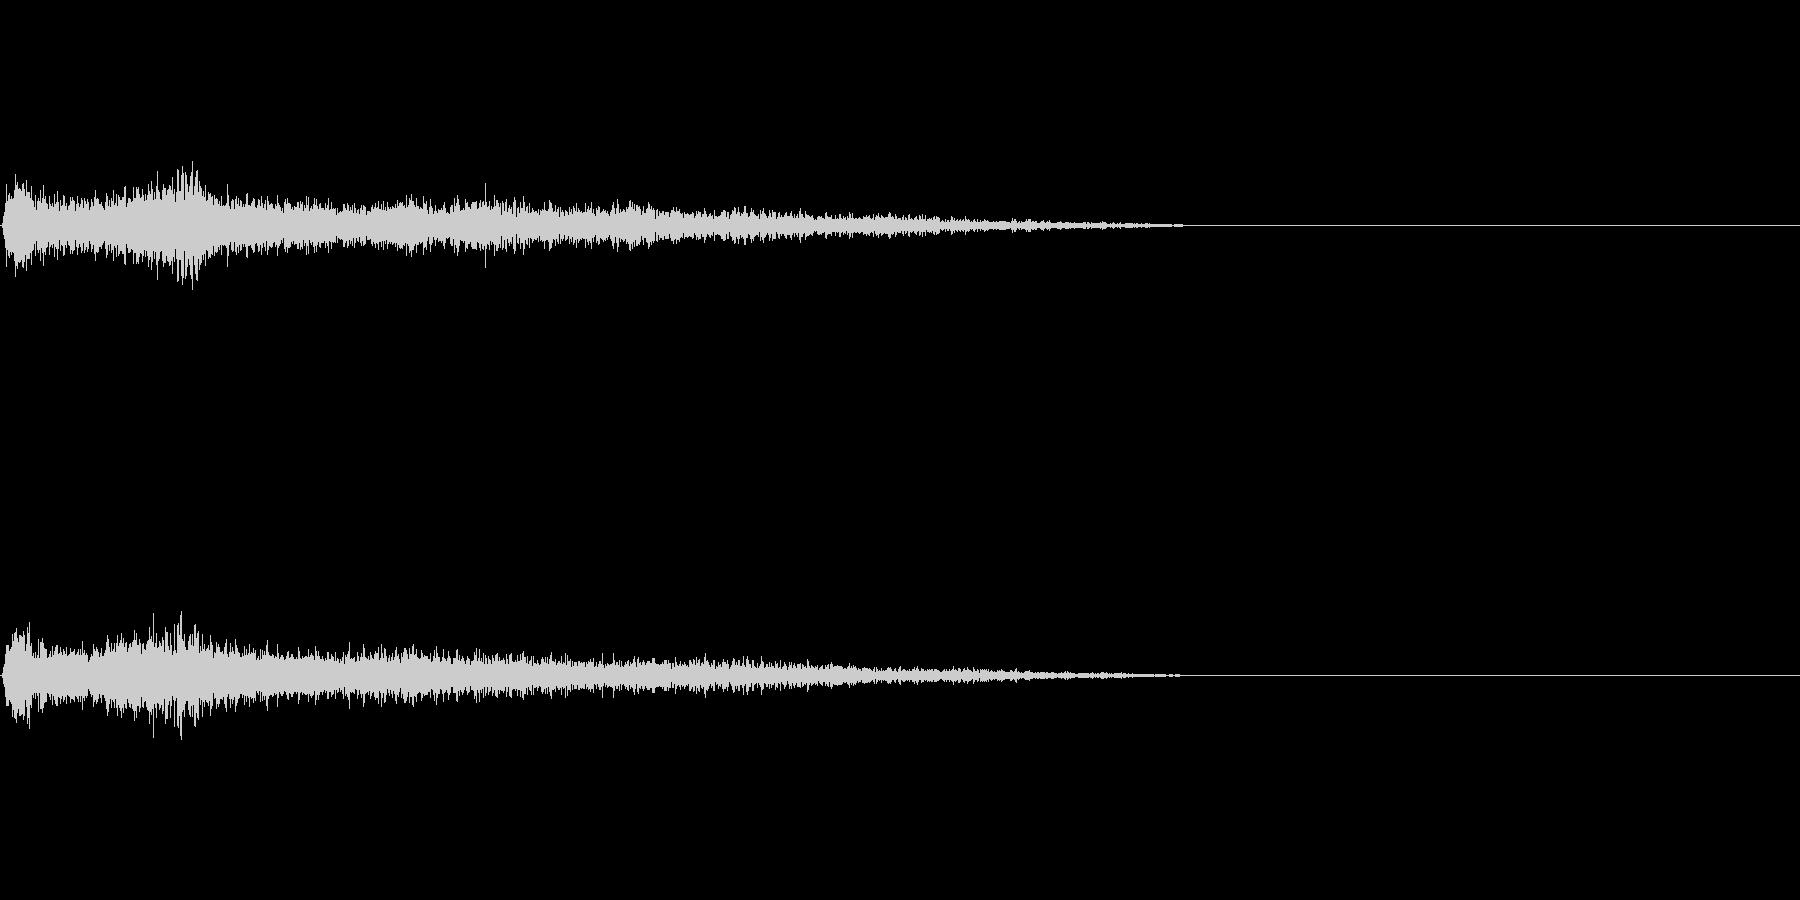 Fマイナー インパクト音 衝撃音の未再生の波形